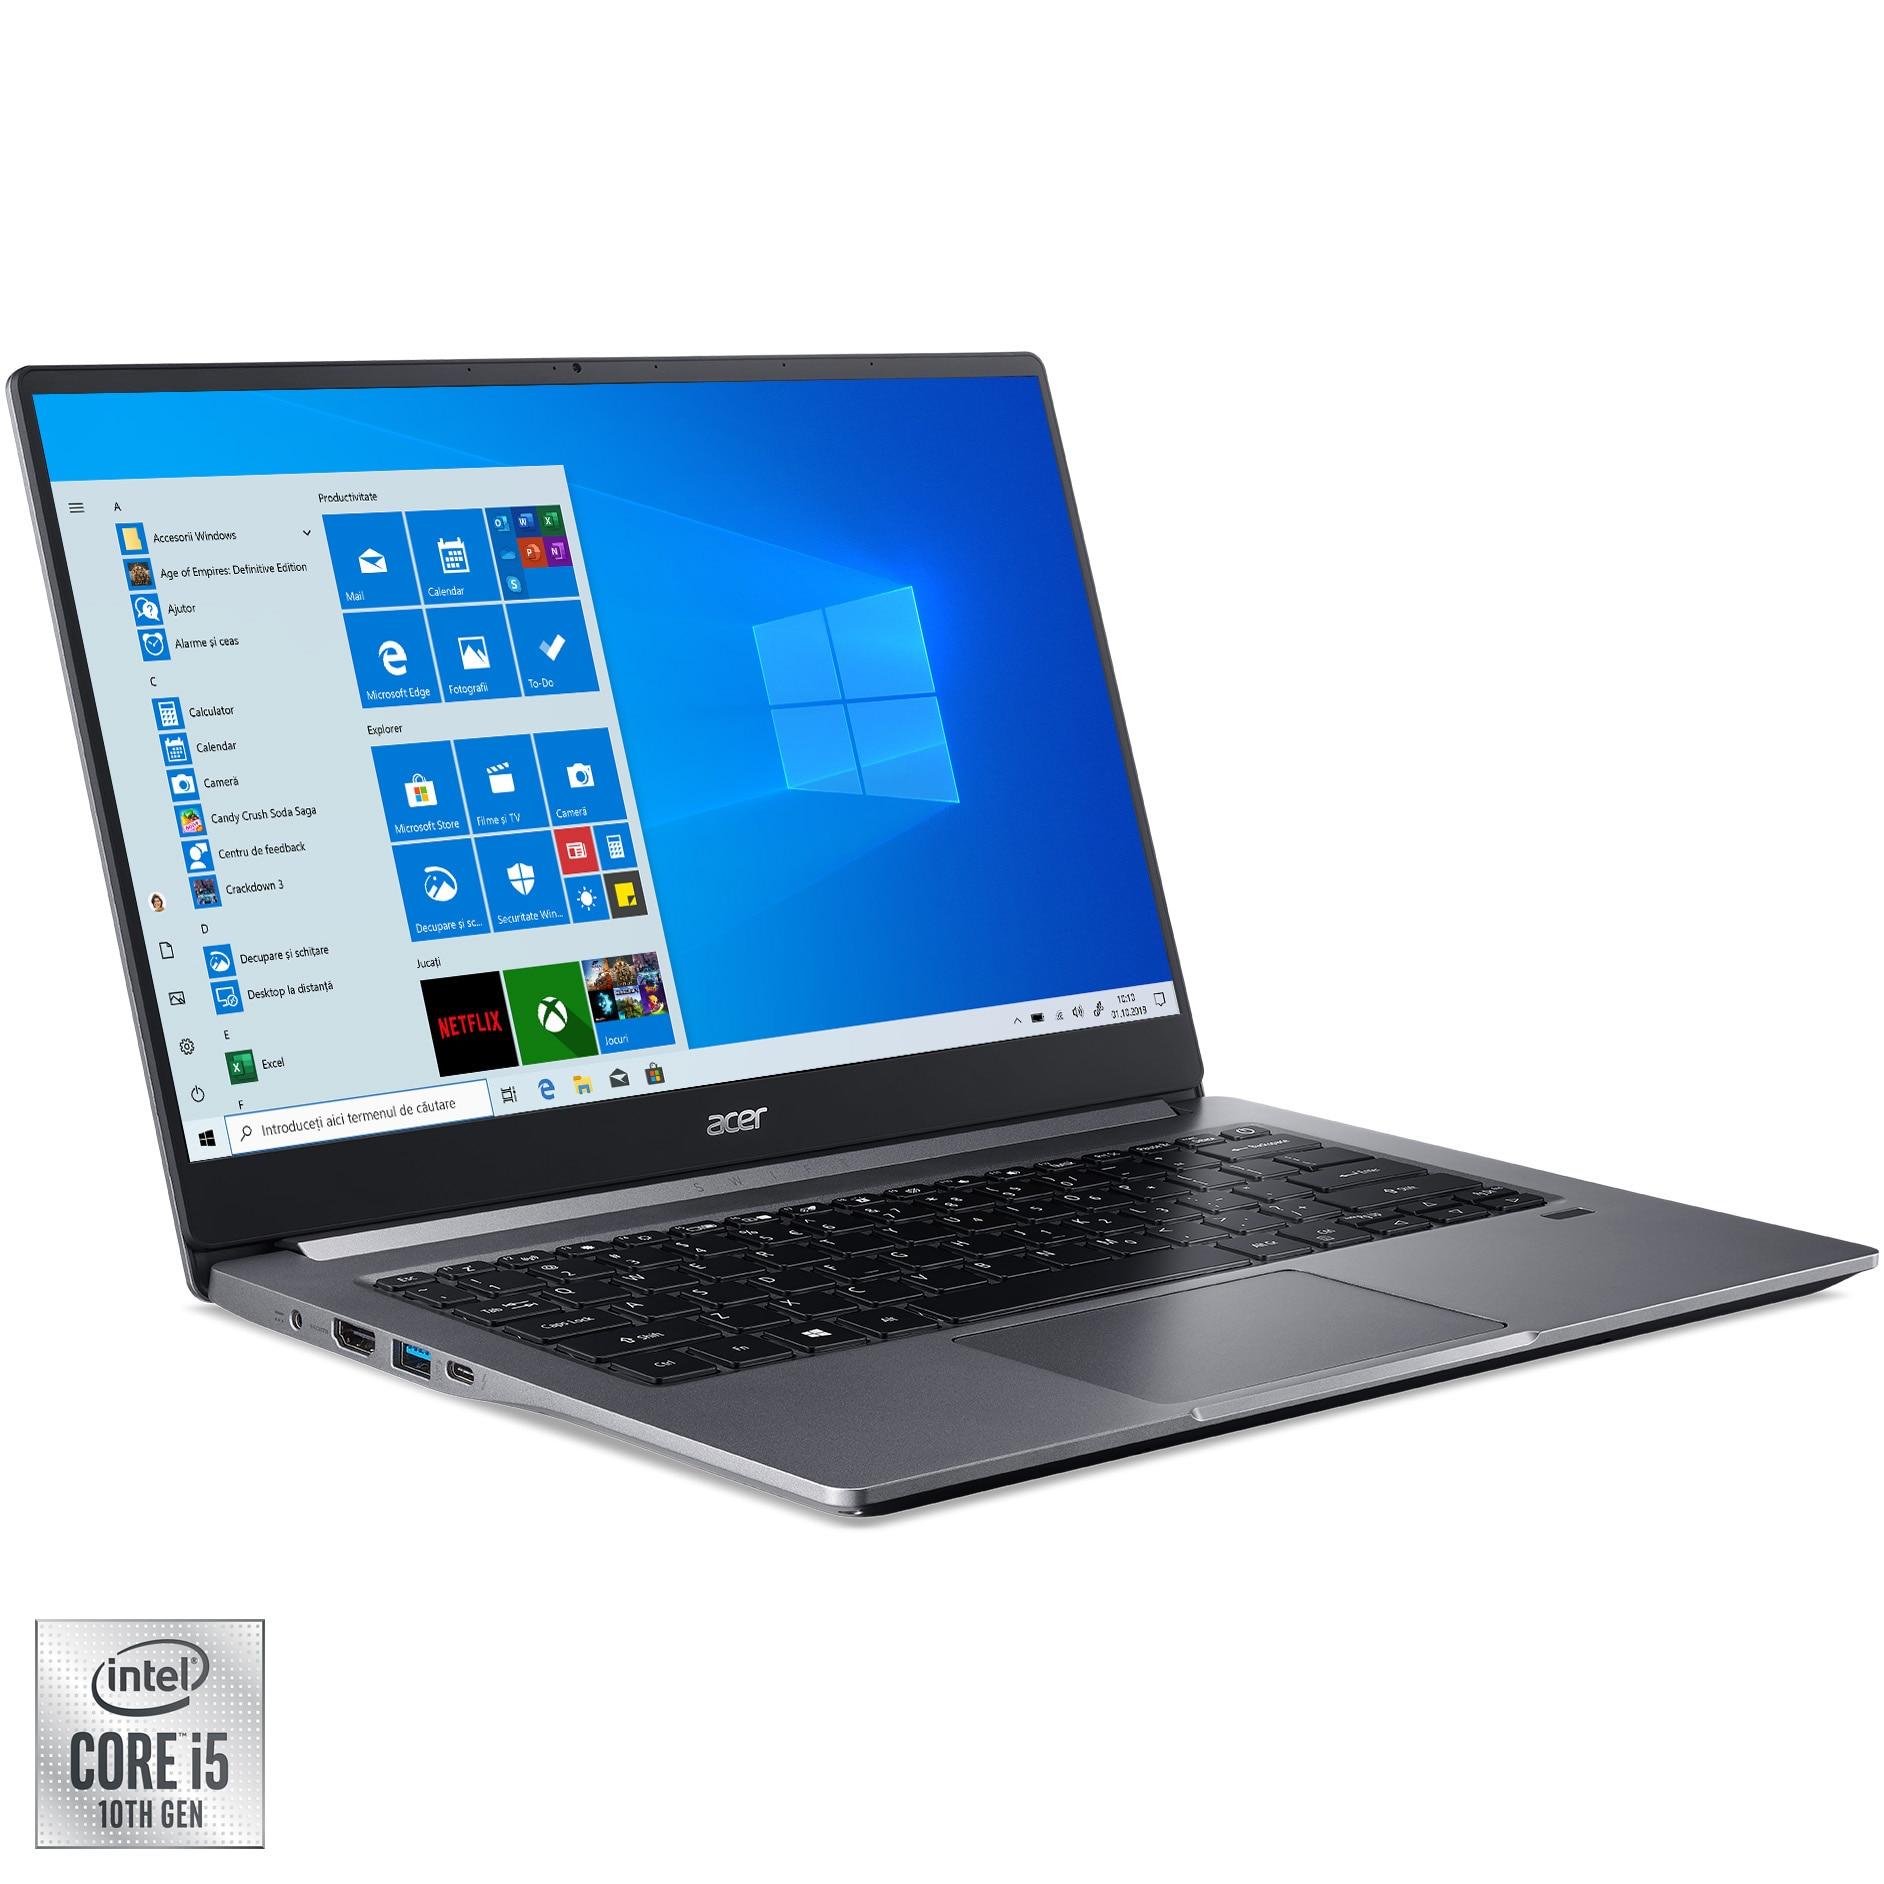 "Fotografie Laptop ultraportabil Acer Swift 3 SF314-57-516Z cu procesor Intel® Core™ i5-1035G1 pana la 3.60 GHz Ice Lake, 14"", Full HD, 8GB, 512GB SSD, Intel UHD Graphics, Windows 10 Home, Steel Gray"